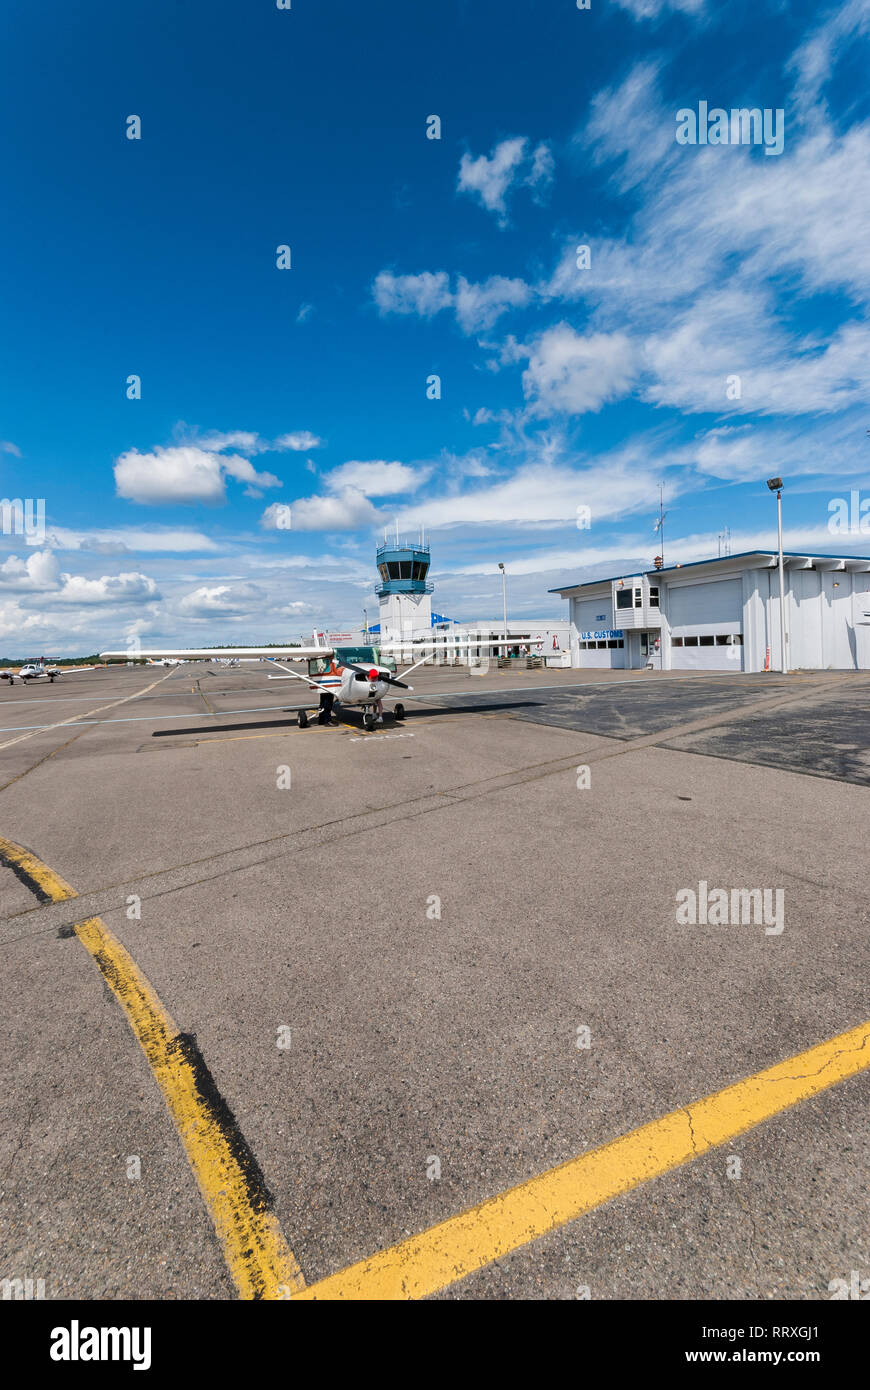 A high-wing small plane at Gig Harbor, Washington airport. - Stock Image